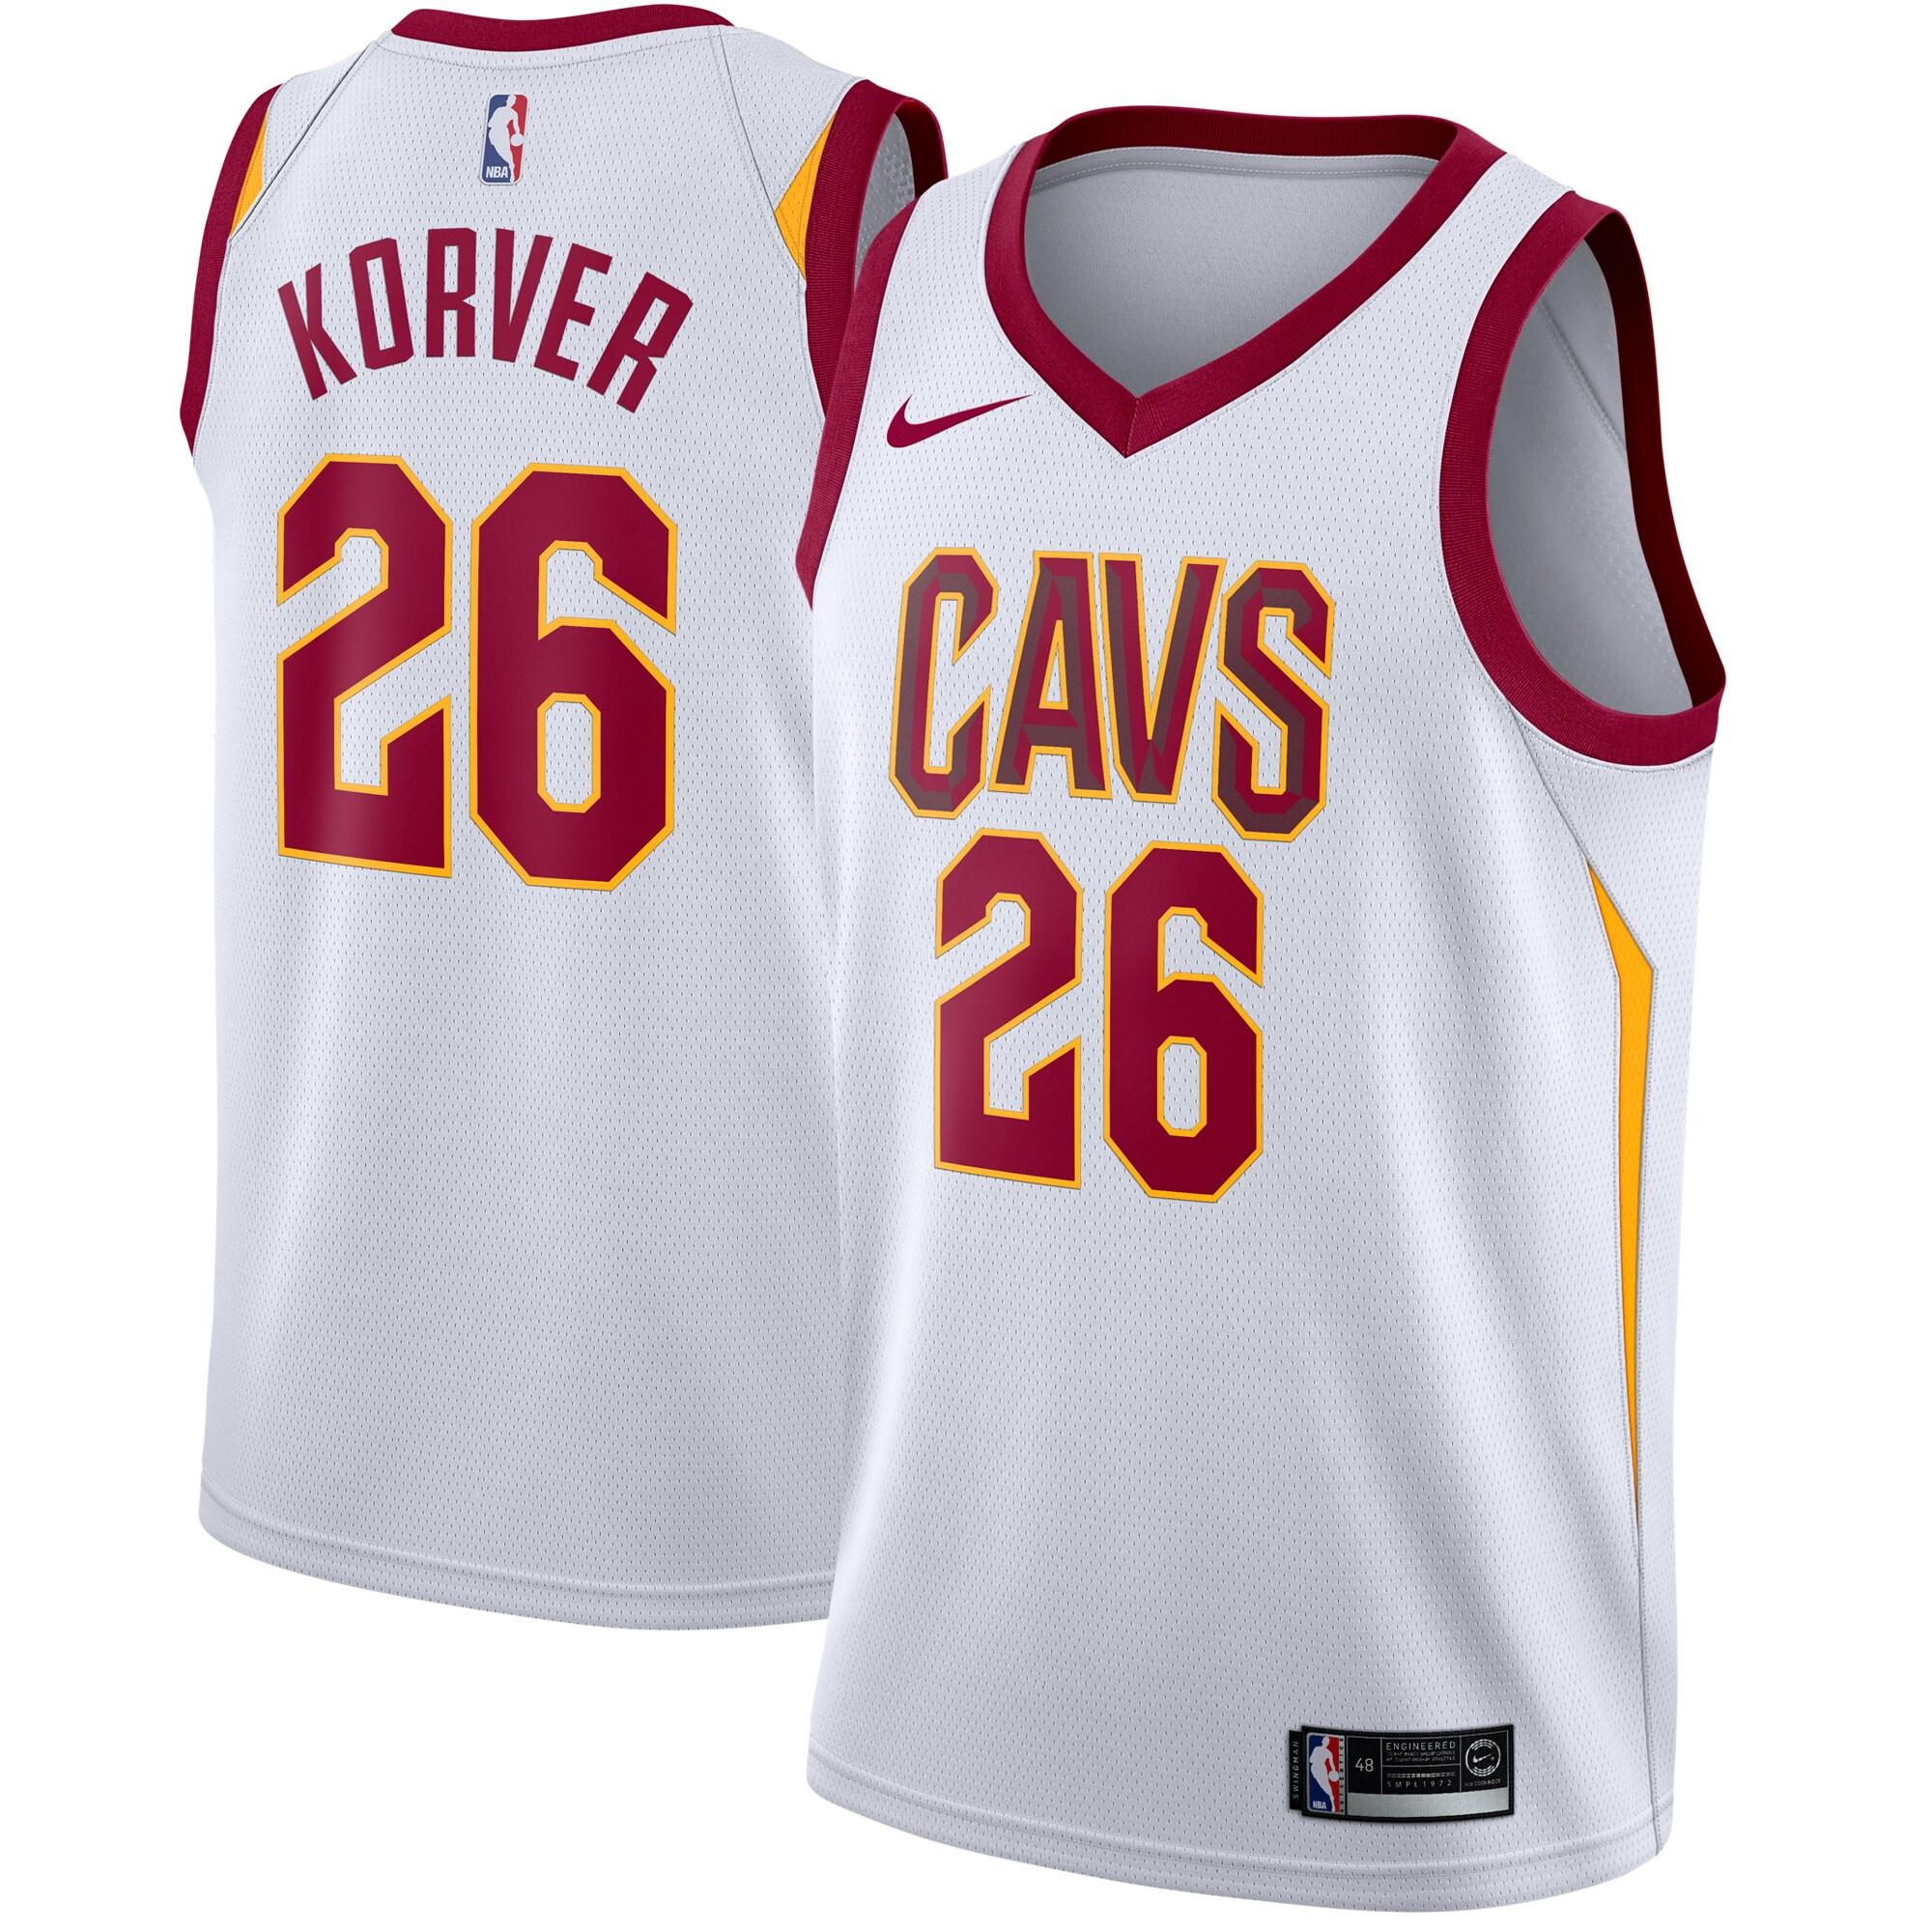 Kyle Korver Cleveland Cavaliers Nike Swingman Jersey White - Association Edition